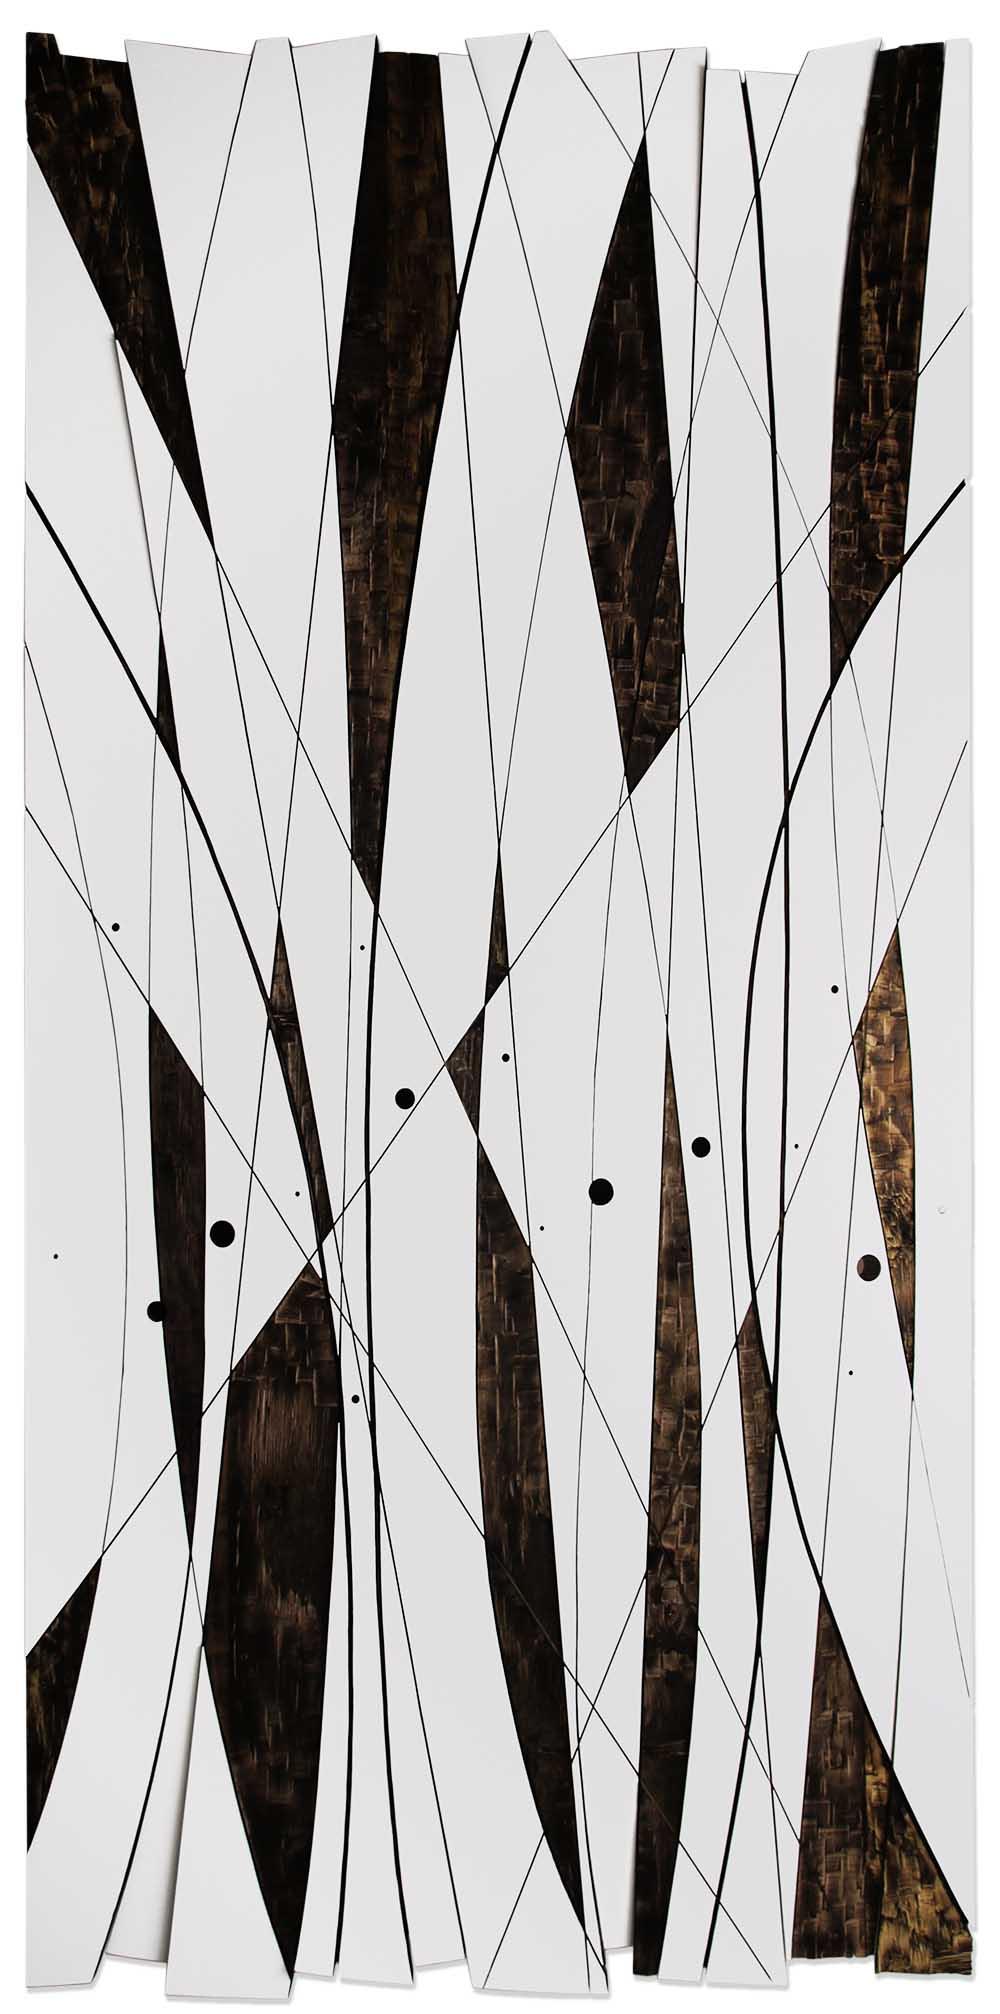 Lars J. Fischedick - Enculturation